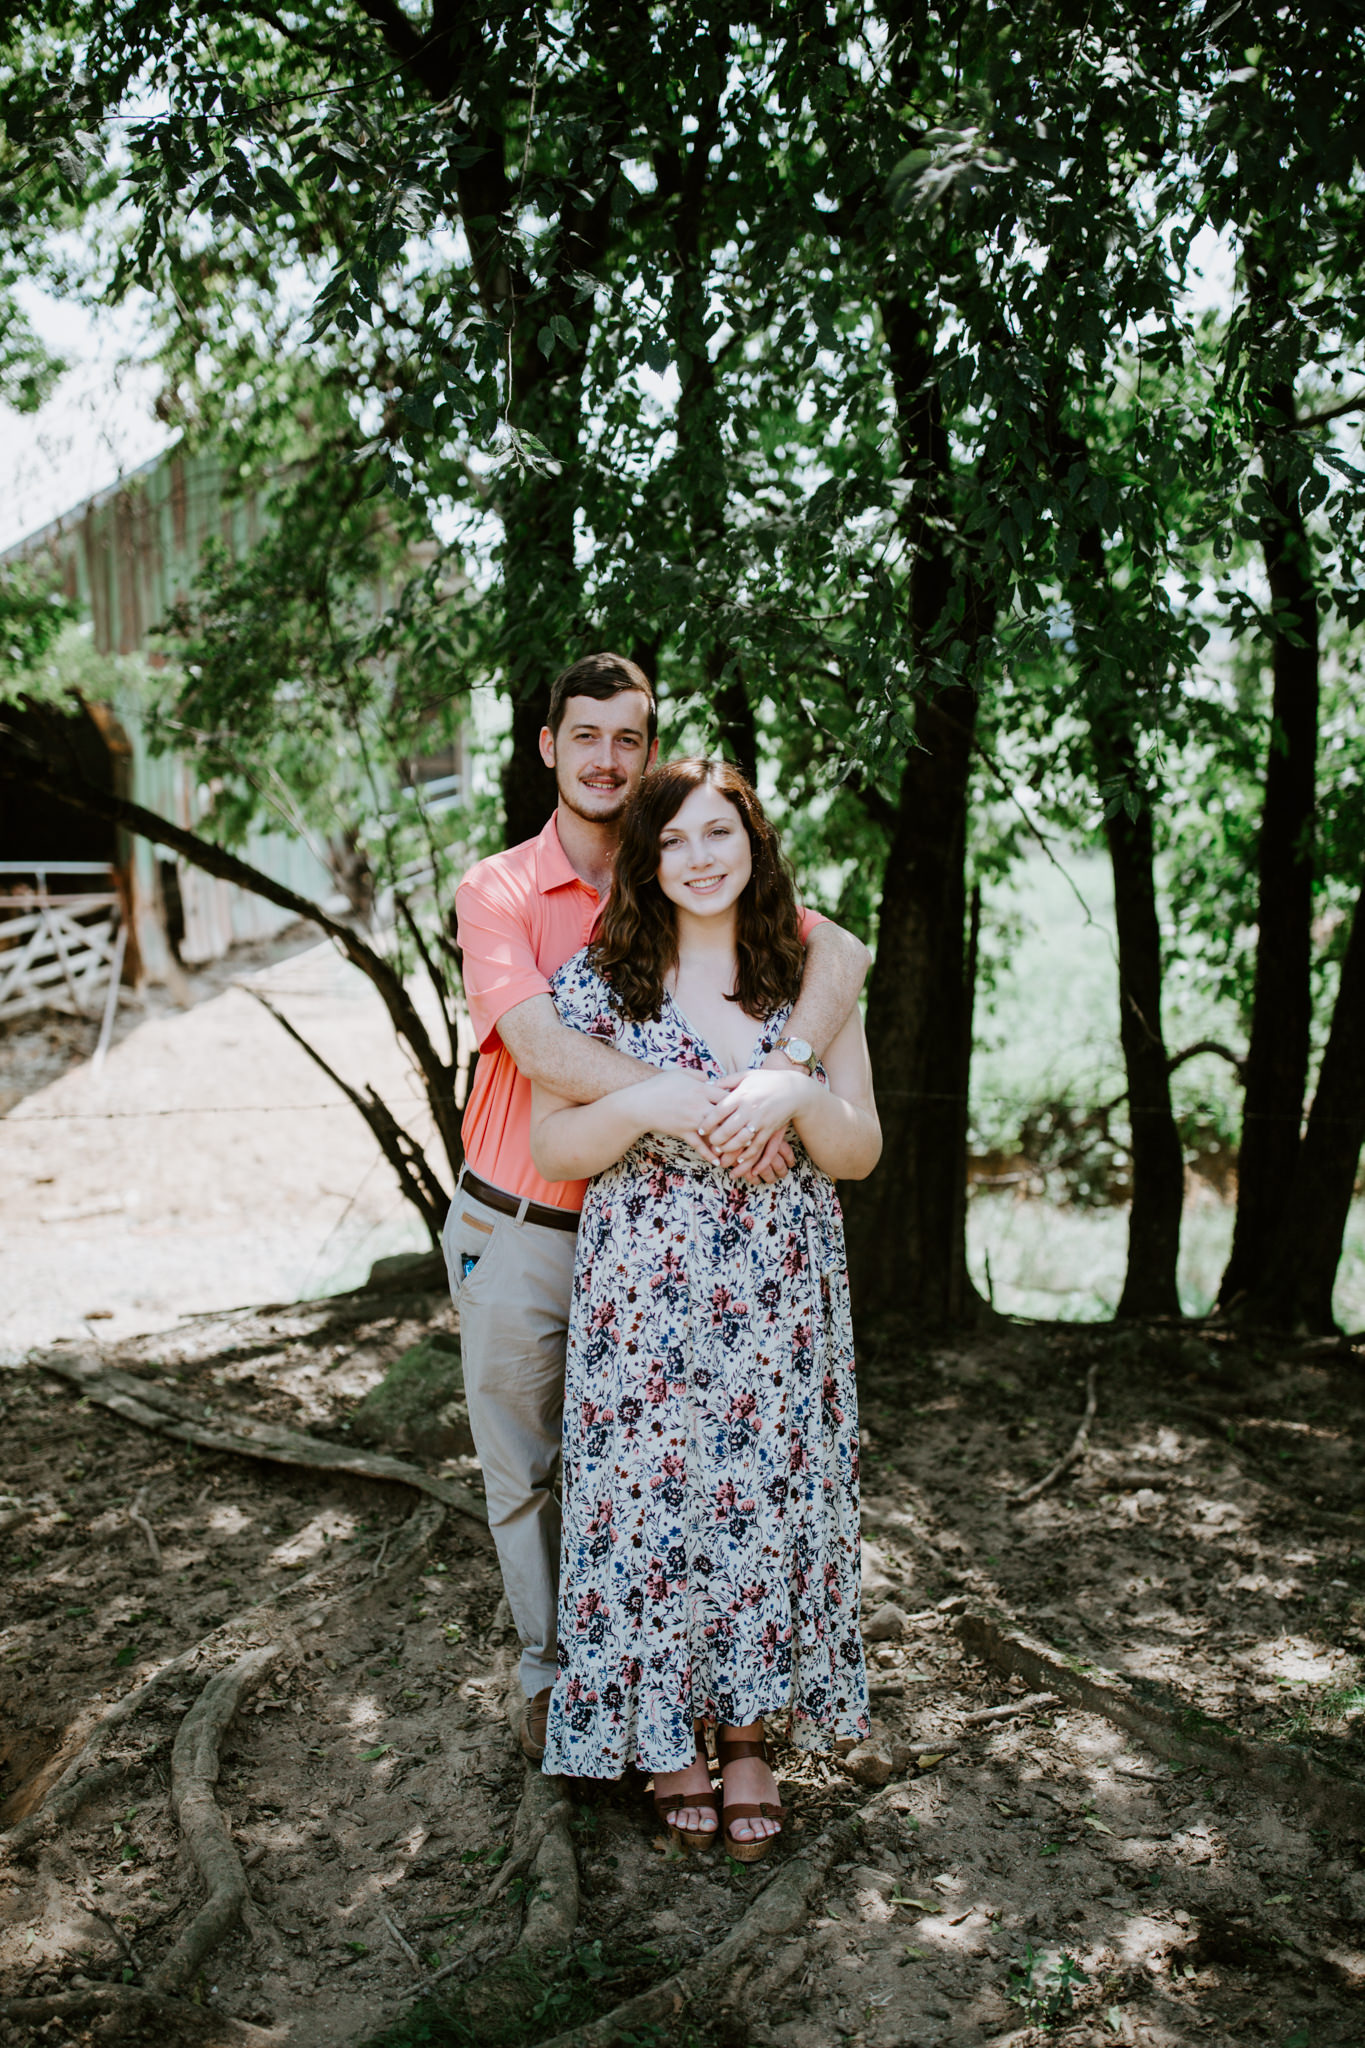 Darby + Connor + Chattanooga + Nashville + Tennessee + Wedding + Photographer-33.jpg